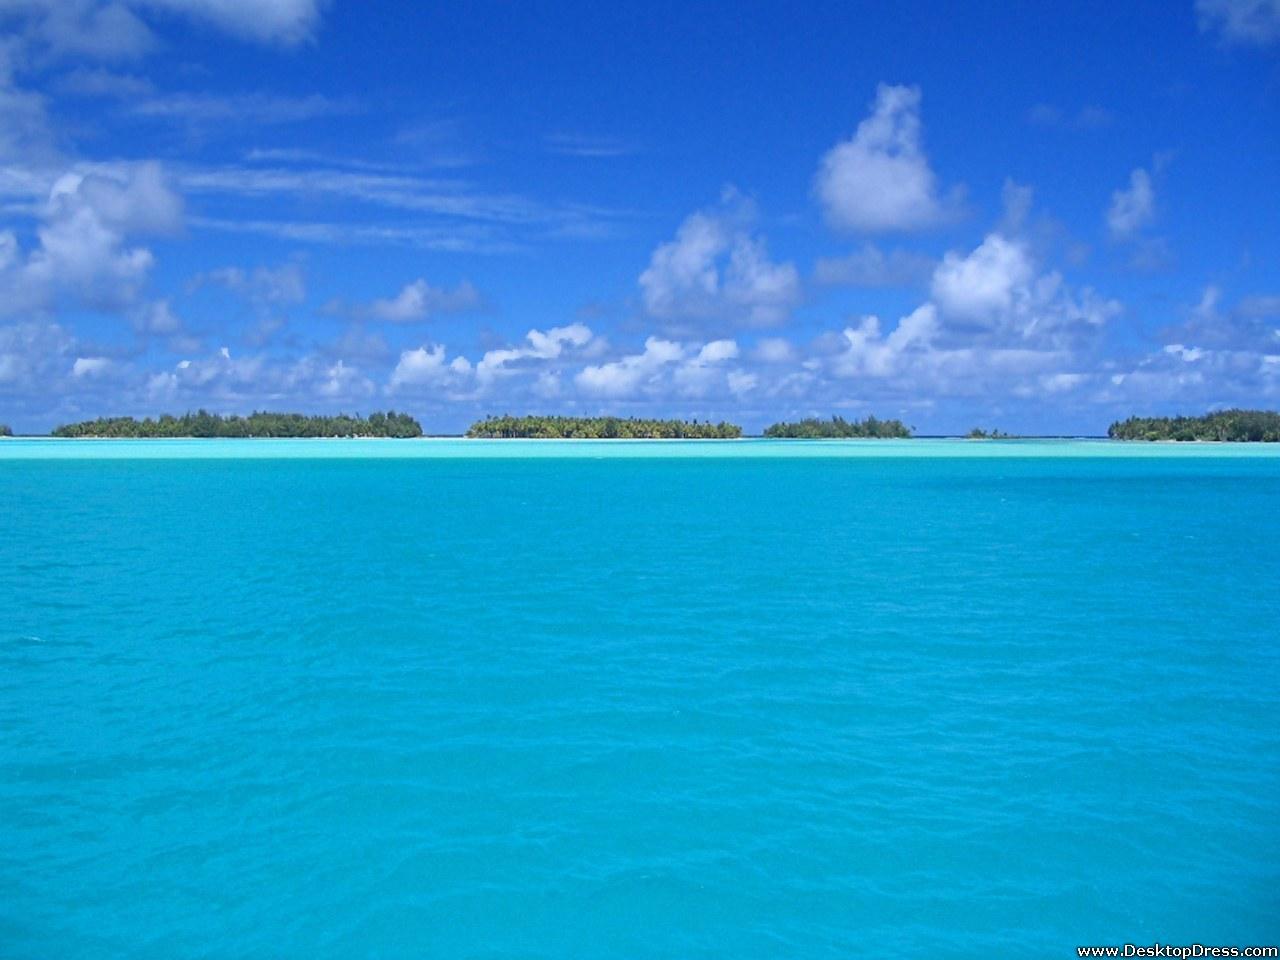 Desktop Wallpapers Natural Backgrounds Motus Bora Bora www 1280x960